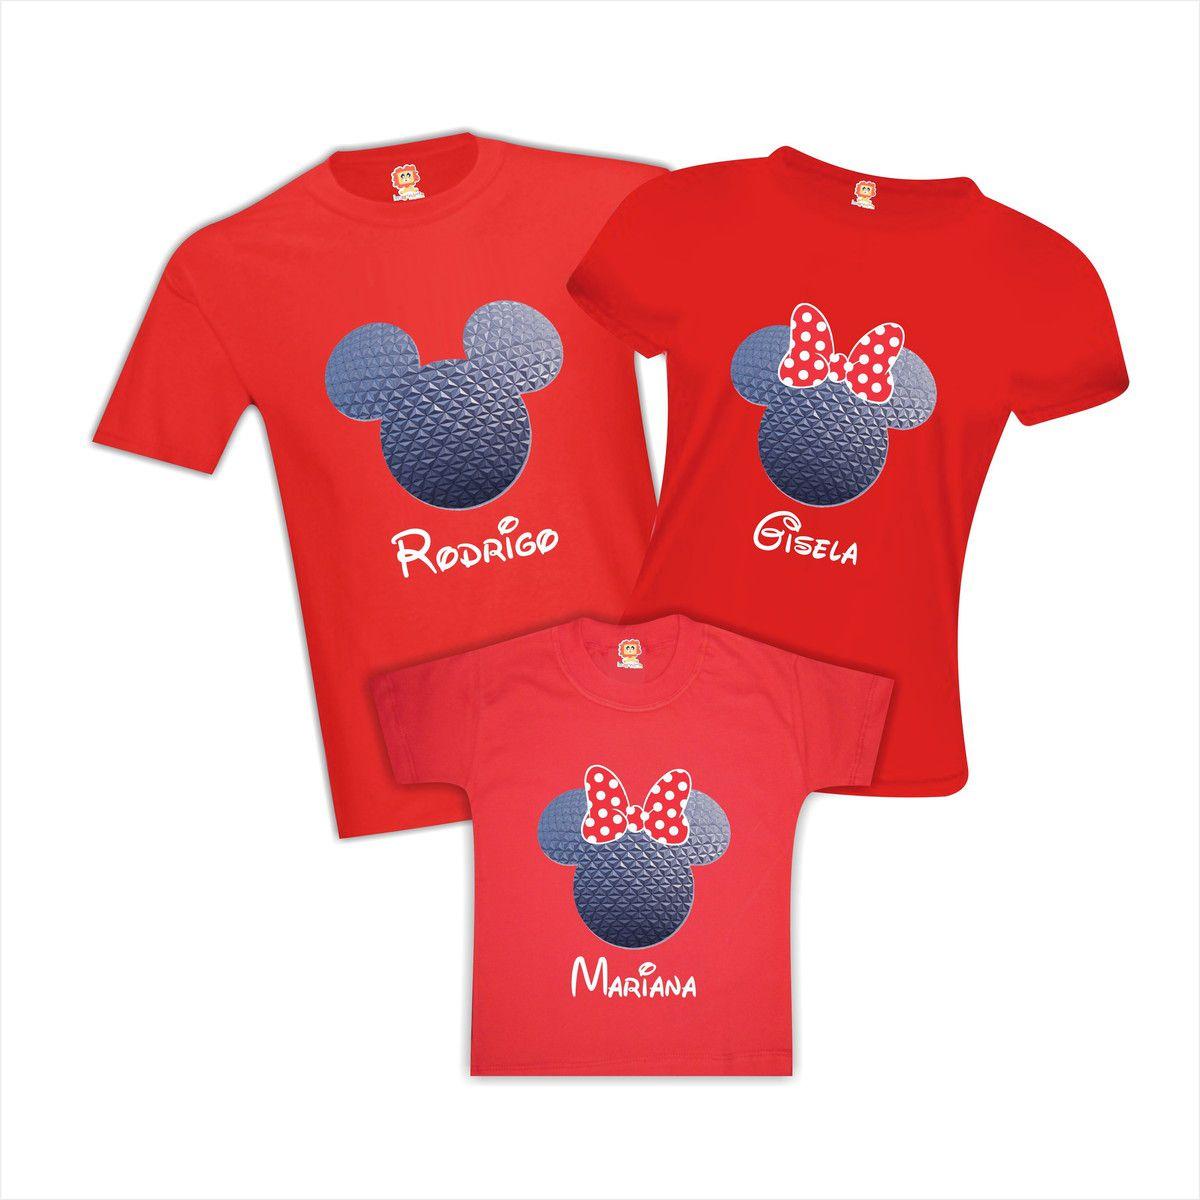 Kit Camisetas Viagem Universal Studios